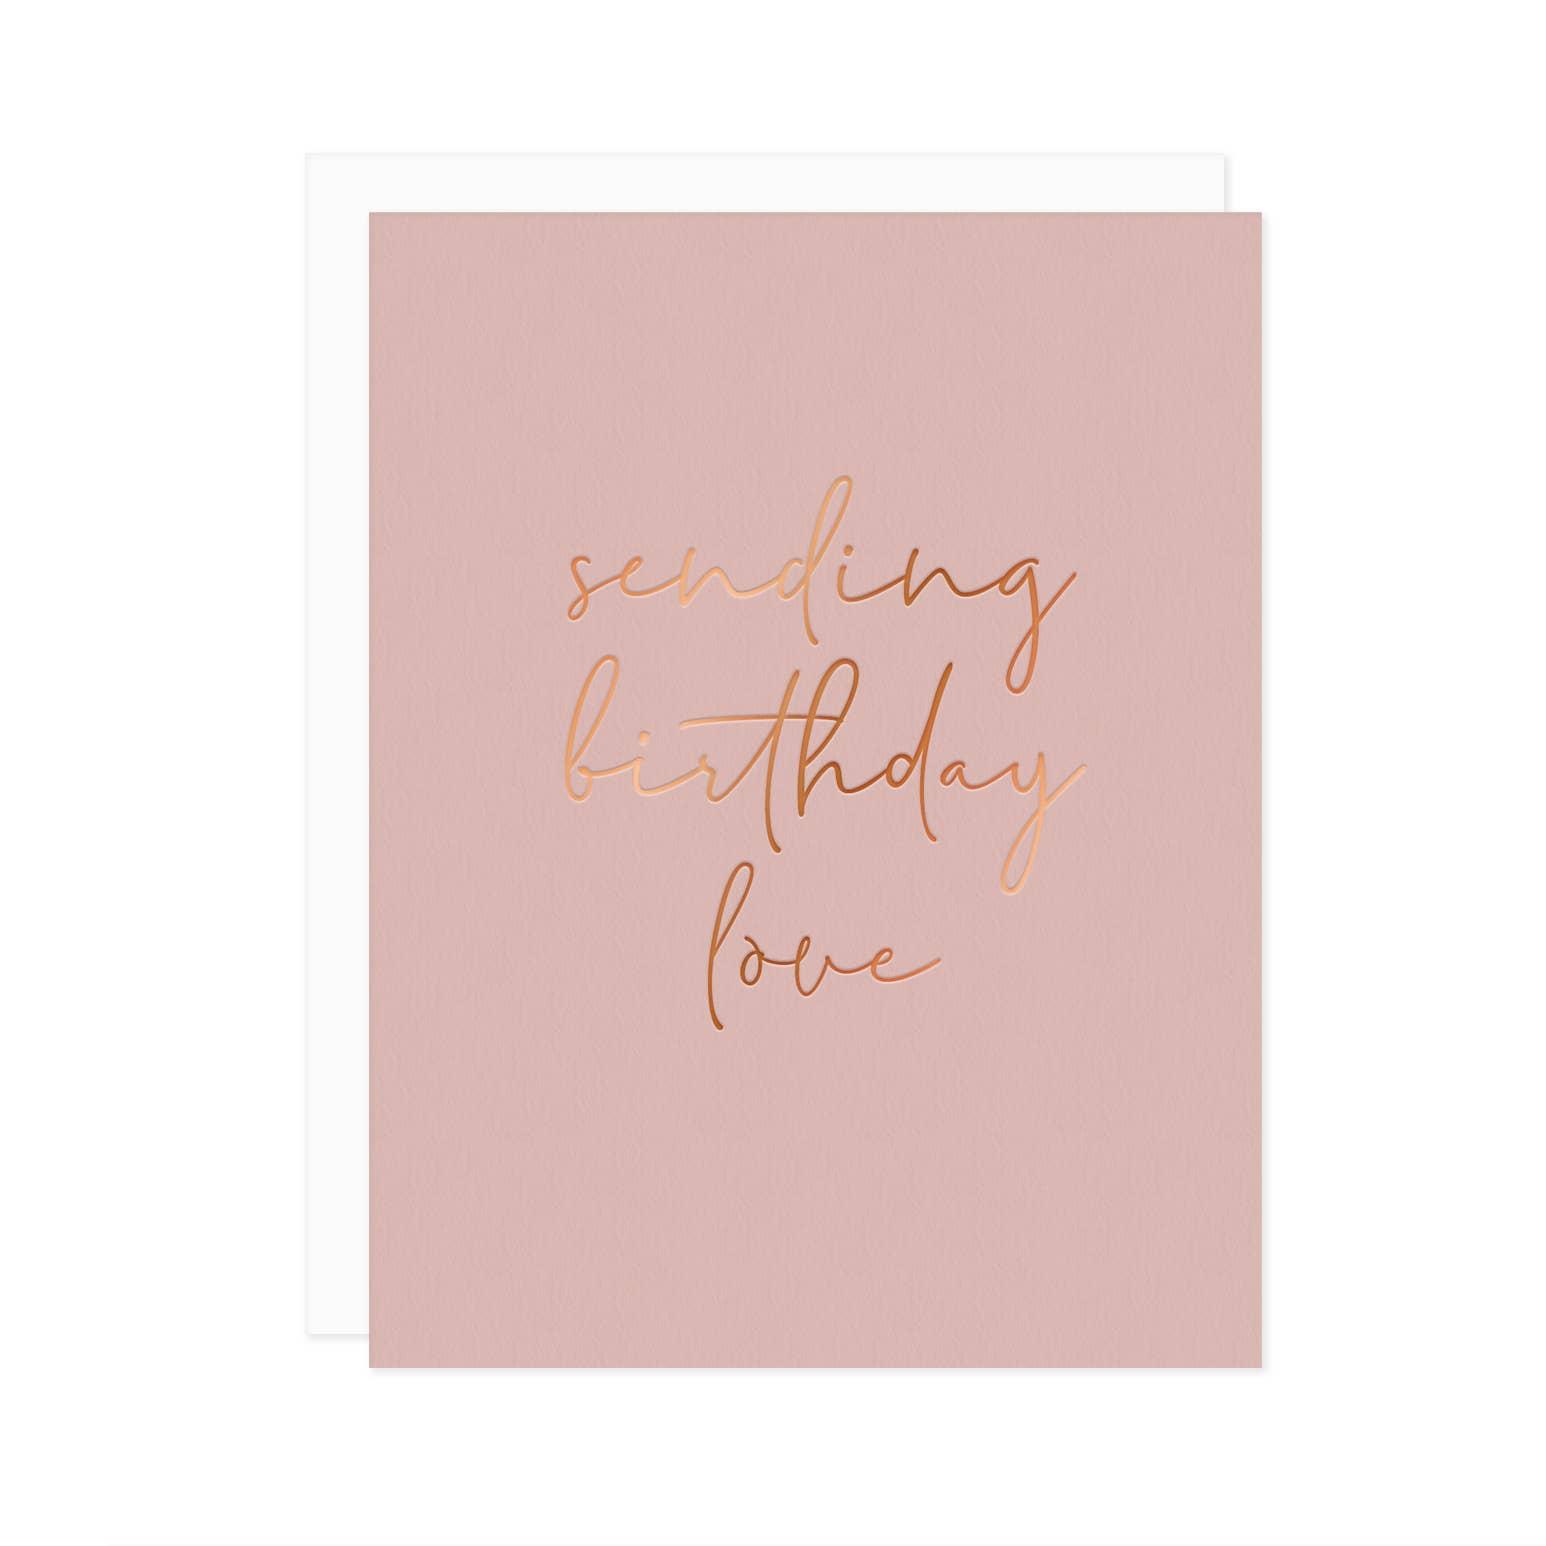 Sending Birthday Love Card | Trada Marketplace